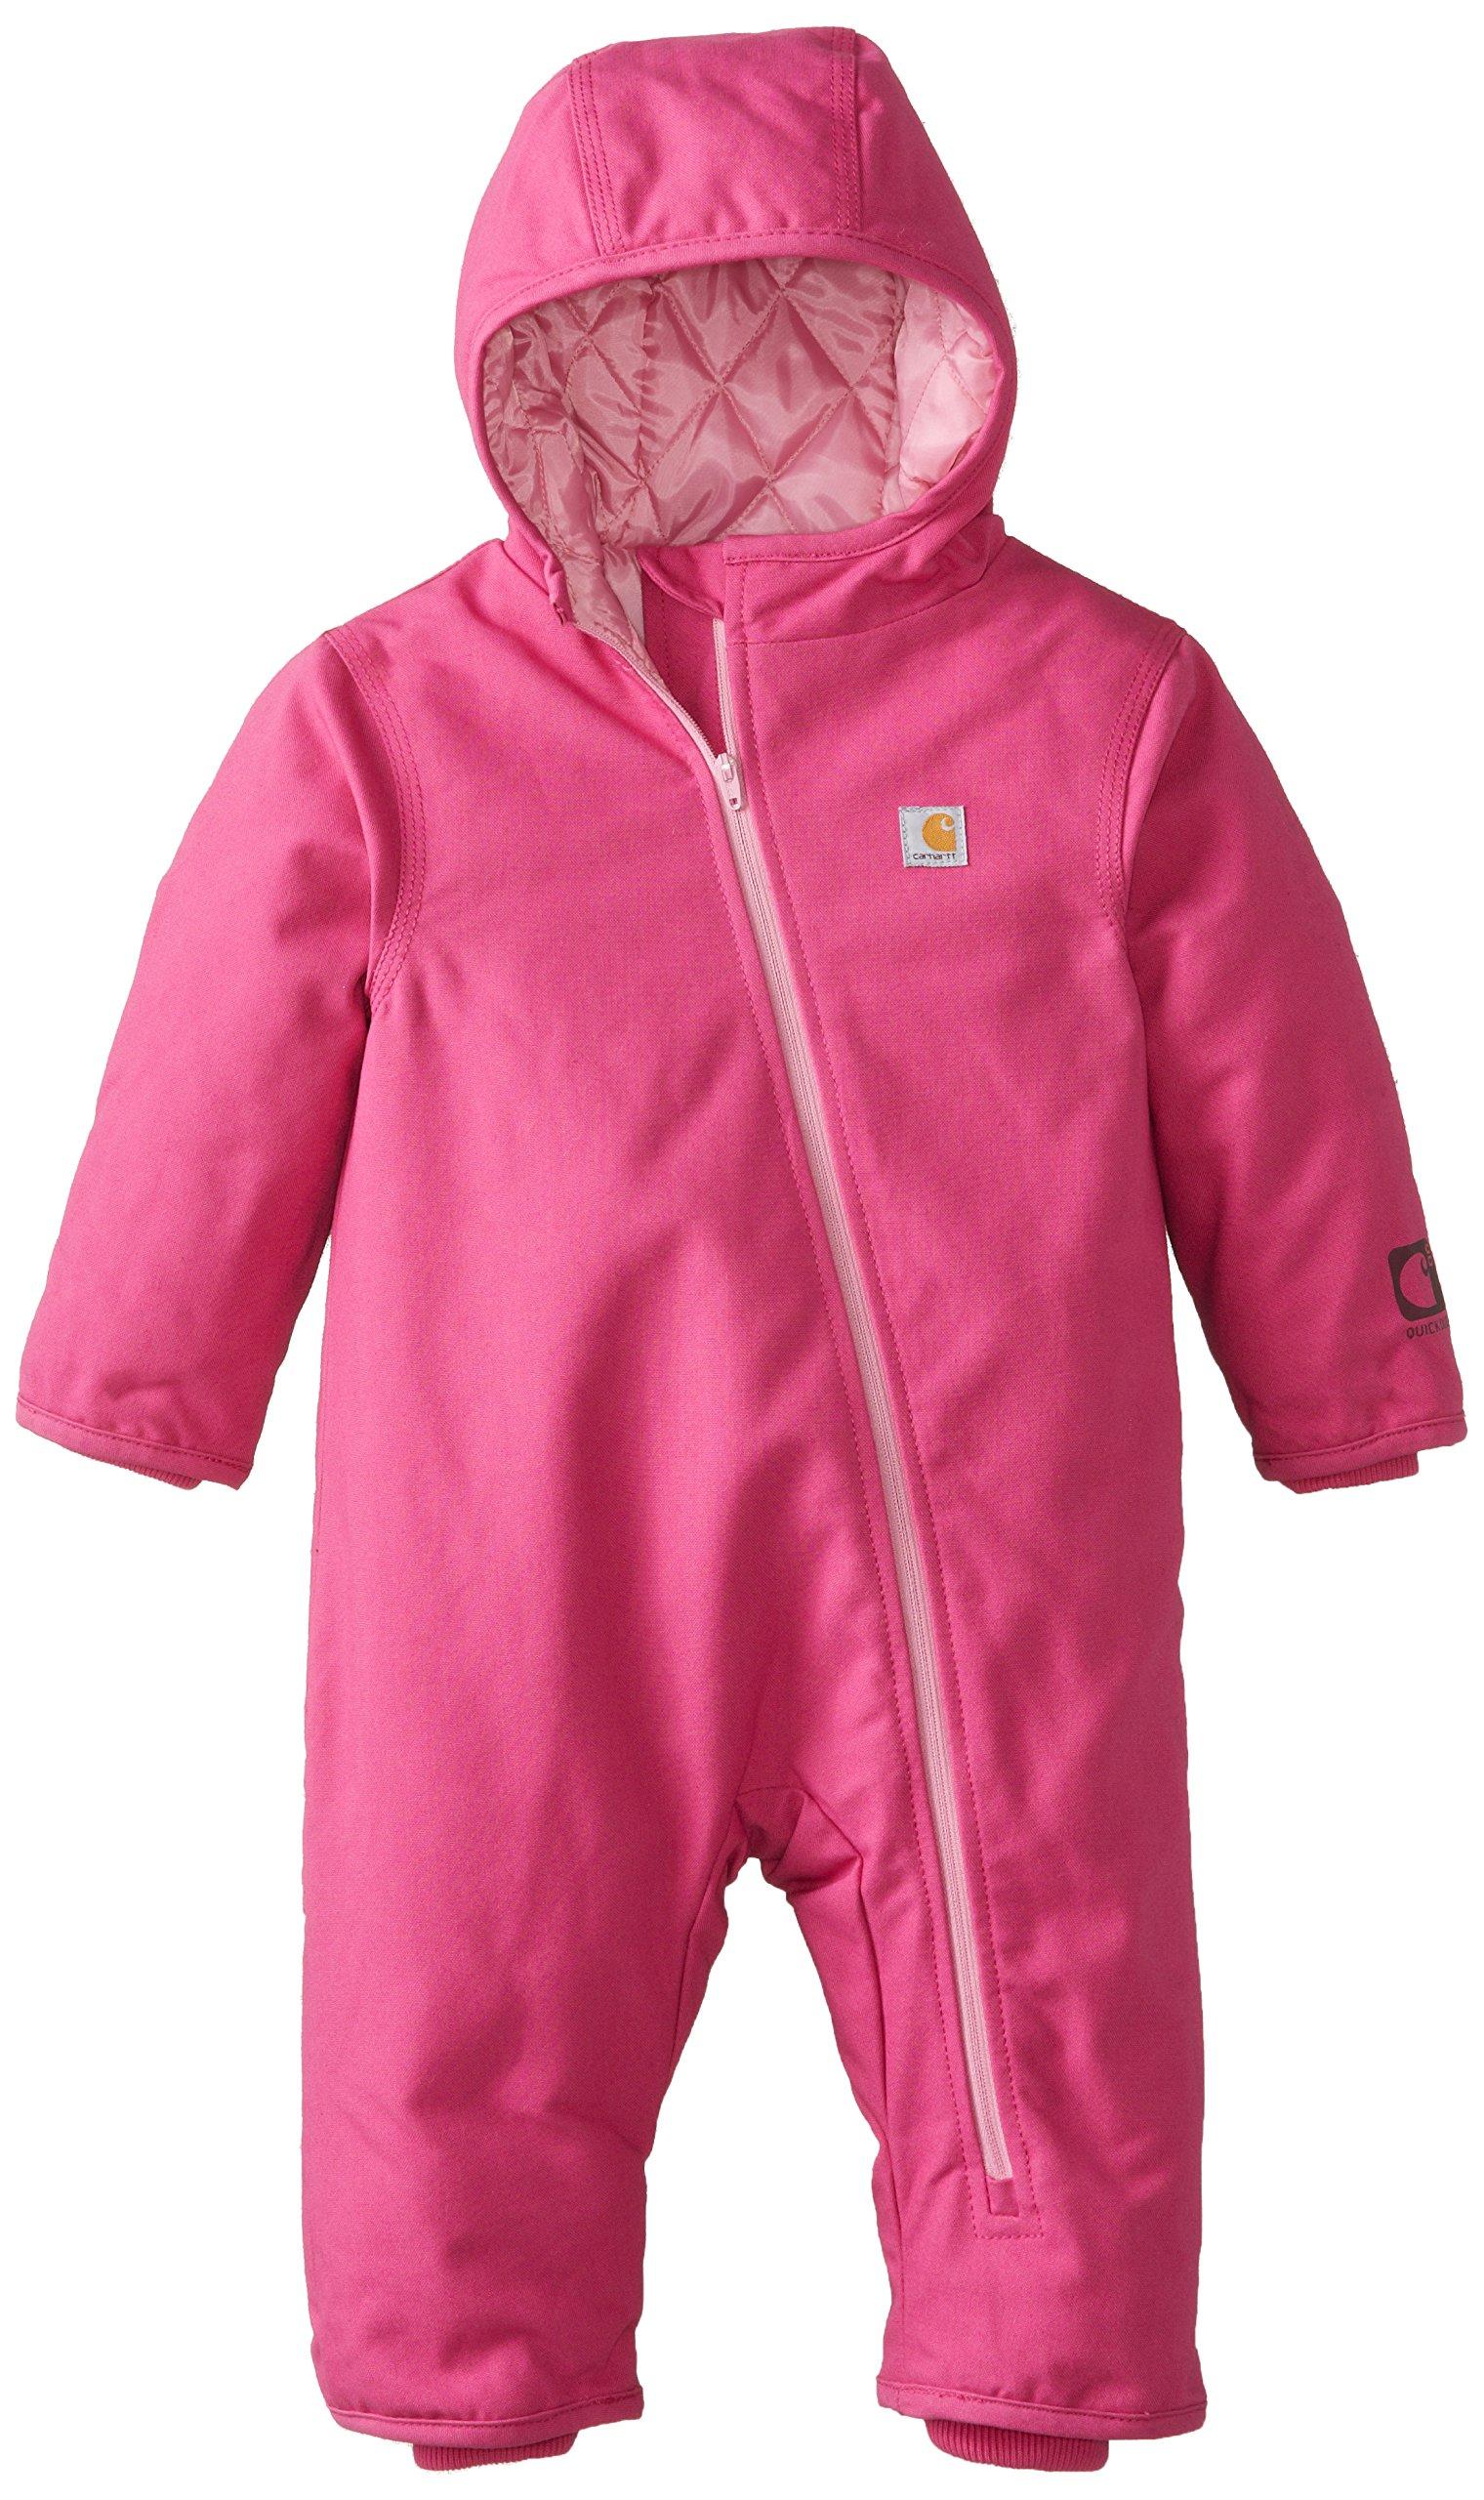 9914477d0c2b Amazon.com  Carhartt Baby Girls  Quick Duck Snowsuit